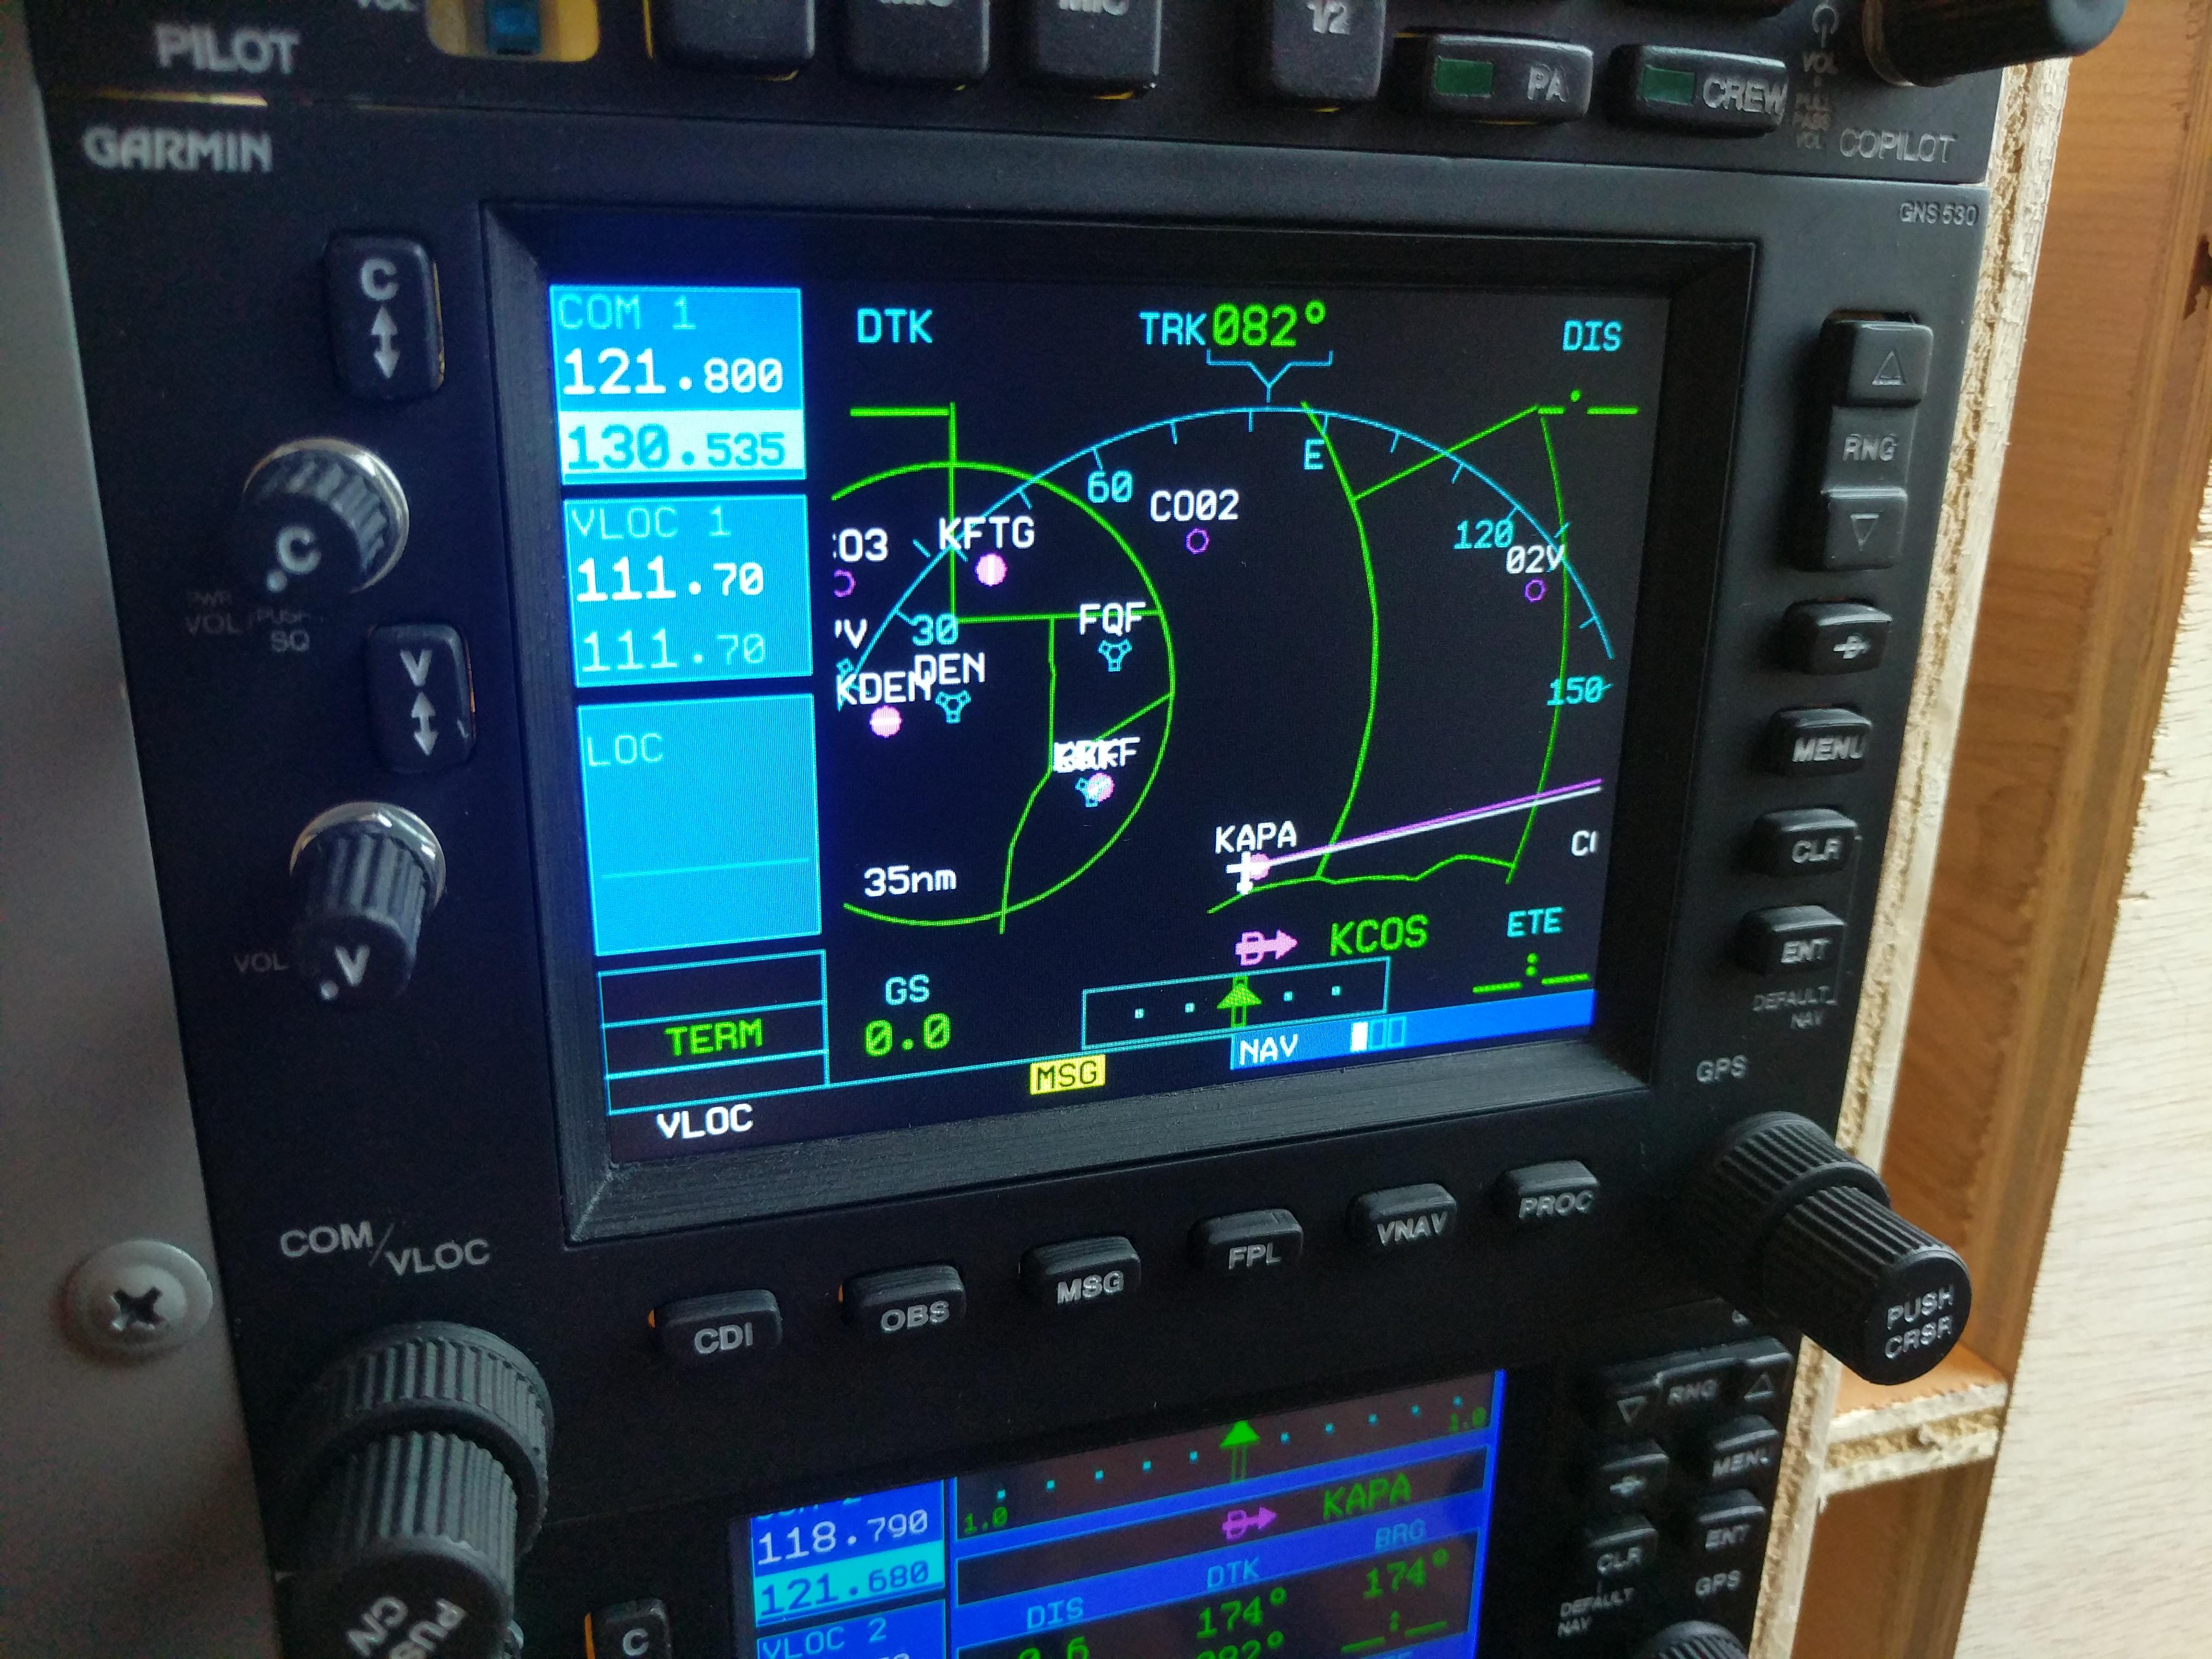 Garmin GNS 530 - Flight Simulator Hardware Interface by allanglen